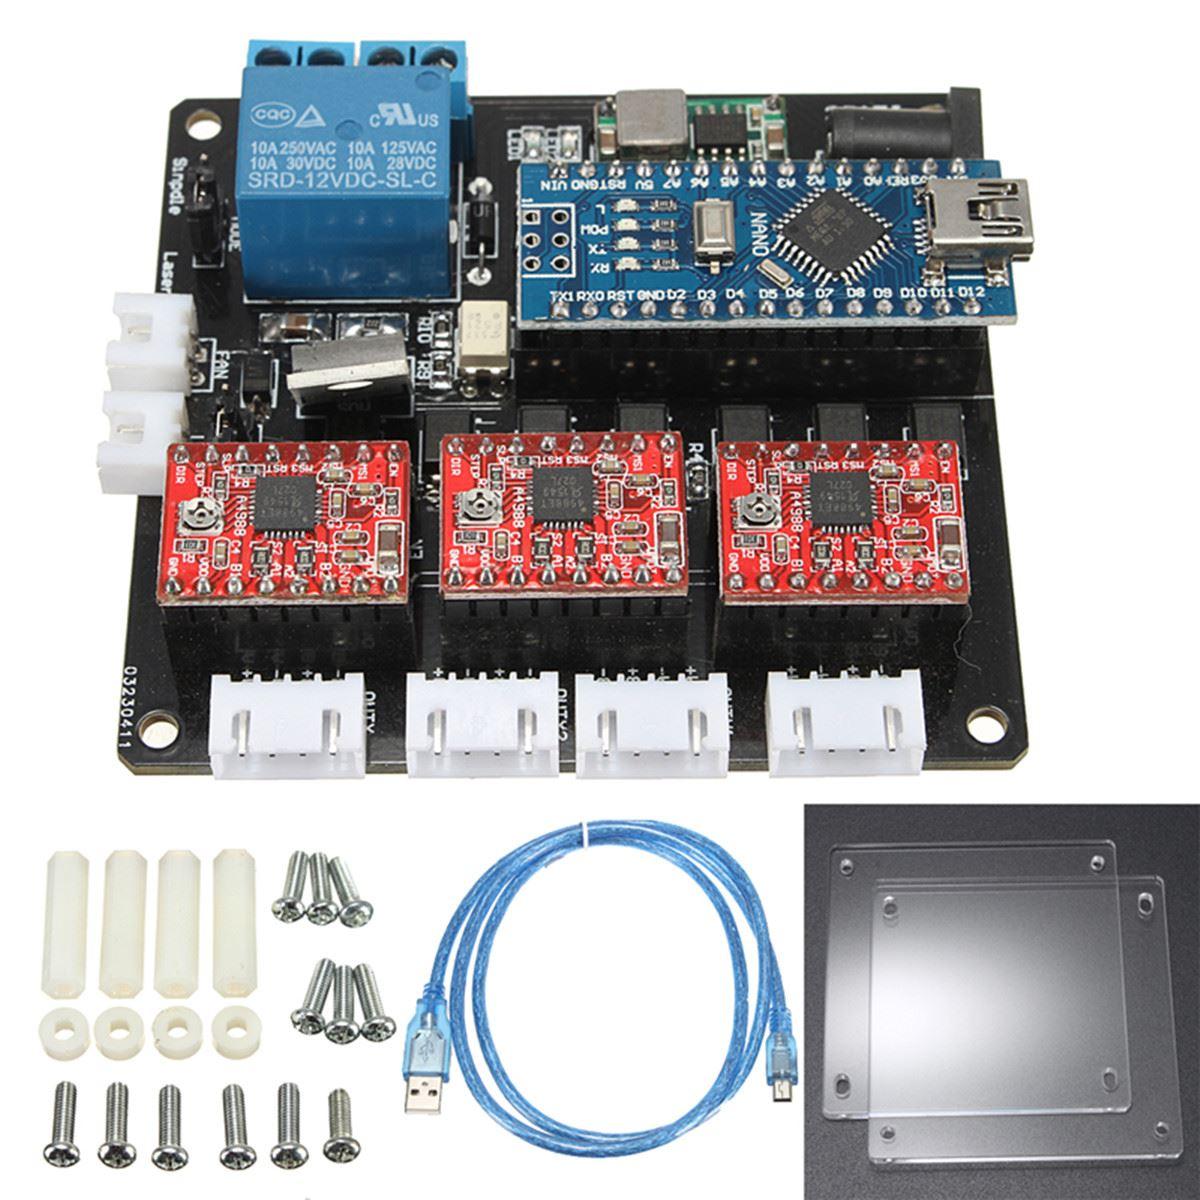 1 Set Usb 3 Axis Stepper Motor Driver Board For Grbl Diy